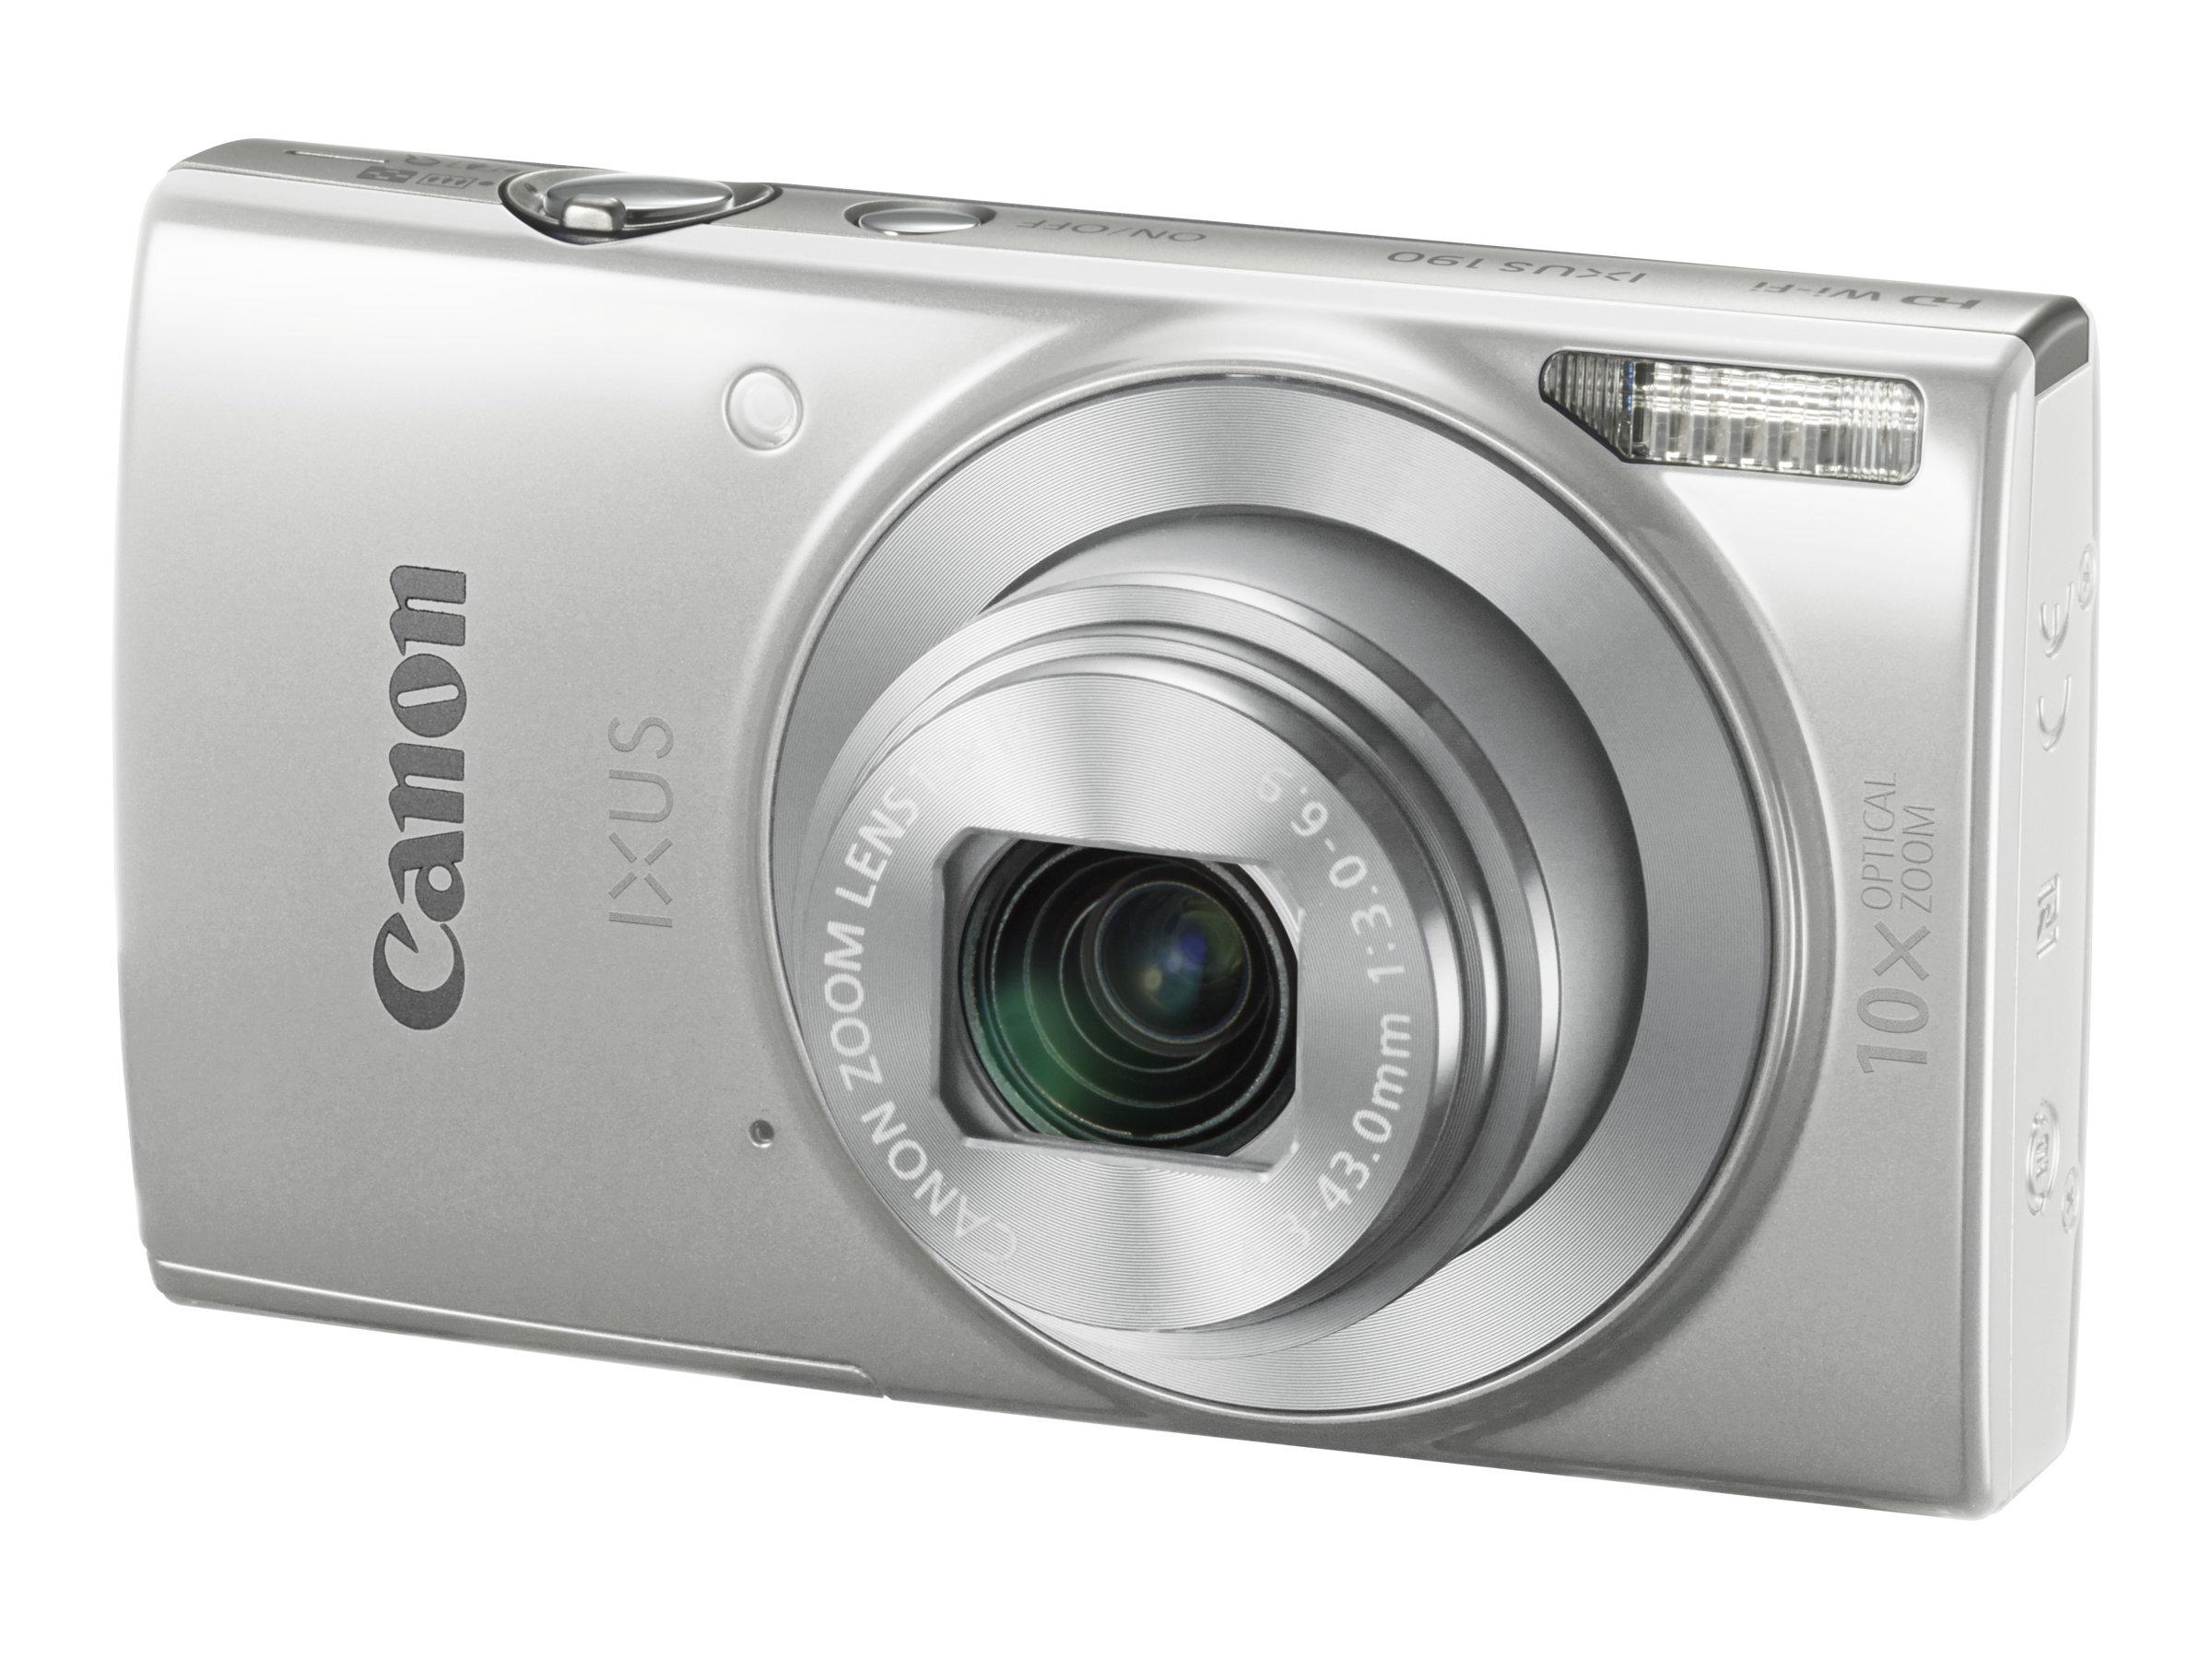 Canon IXUS 190 - Digitalkamera